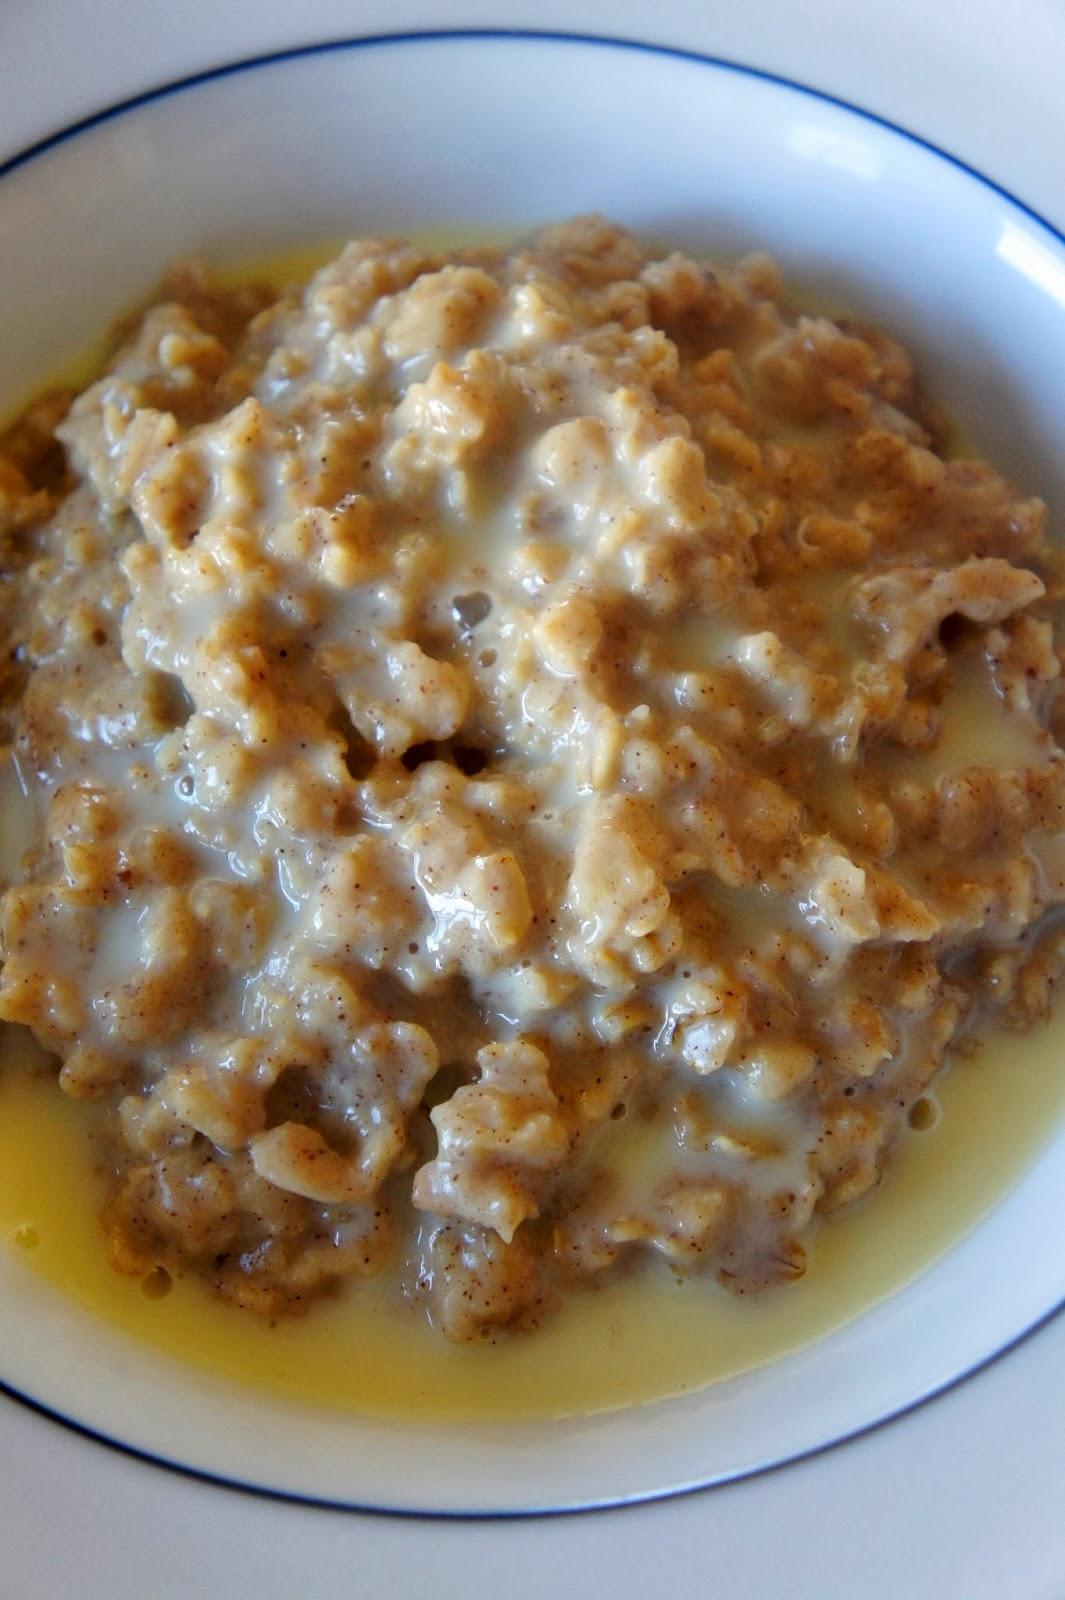 Savory Sweet and Satisfying: Eggnog Oatmeal